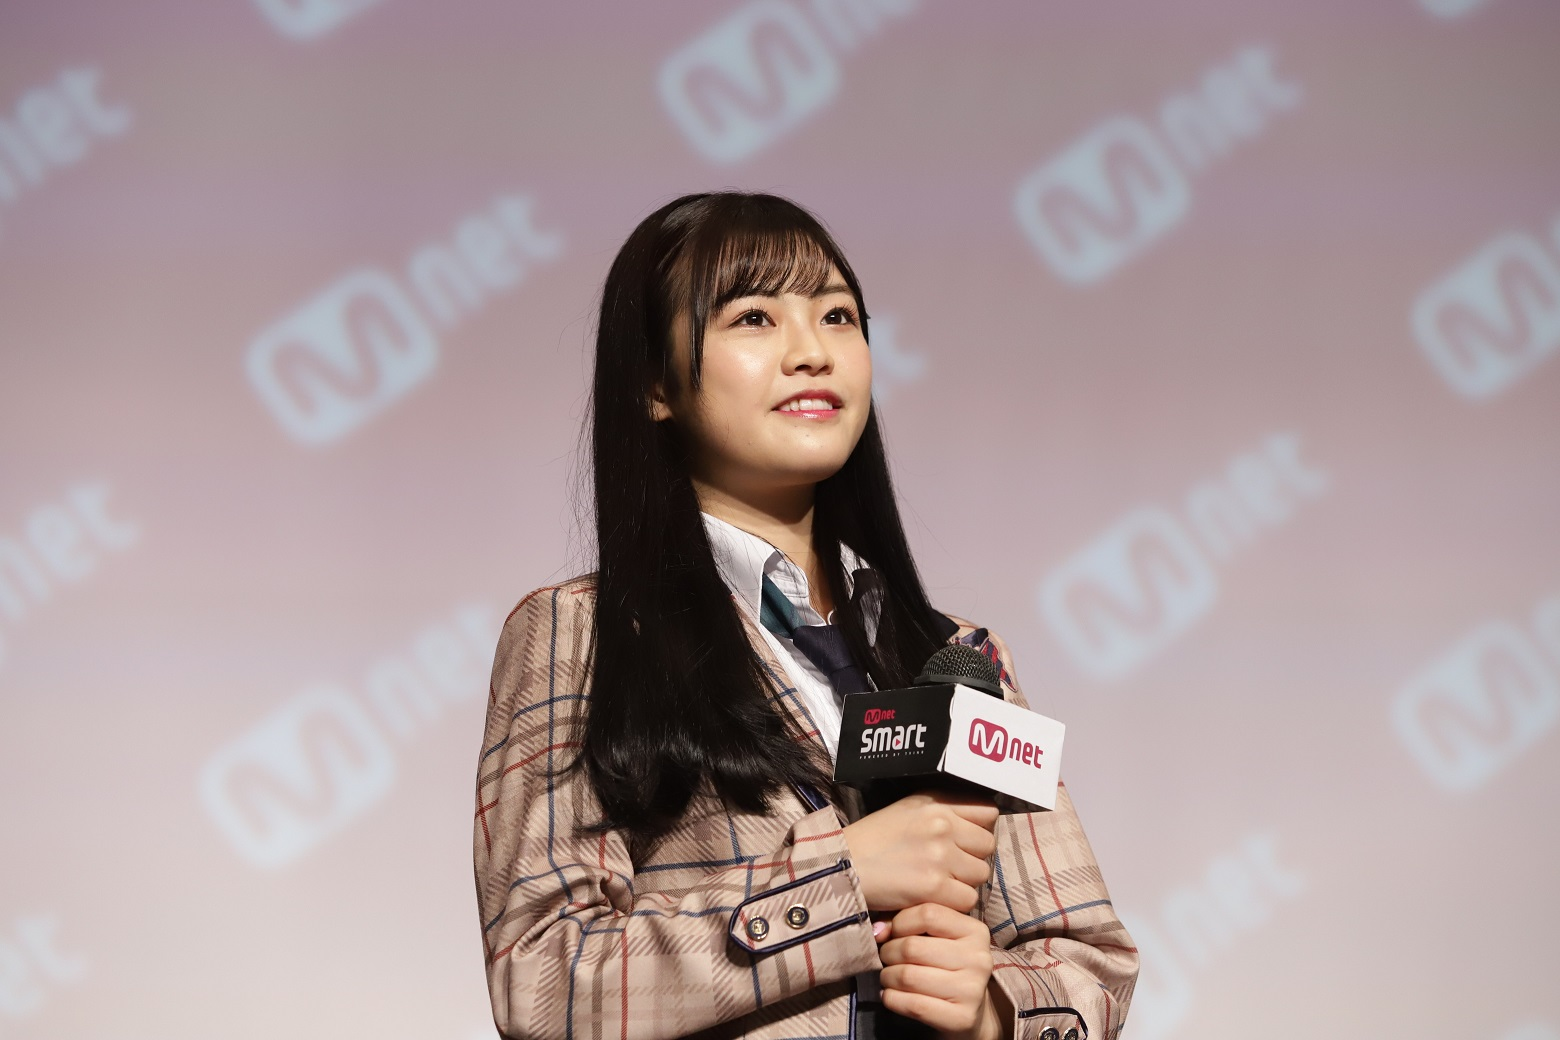 宮脇咲良 ©Mnet Japan